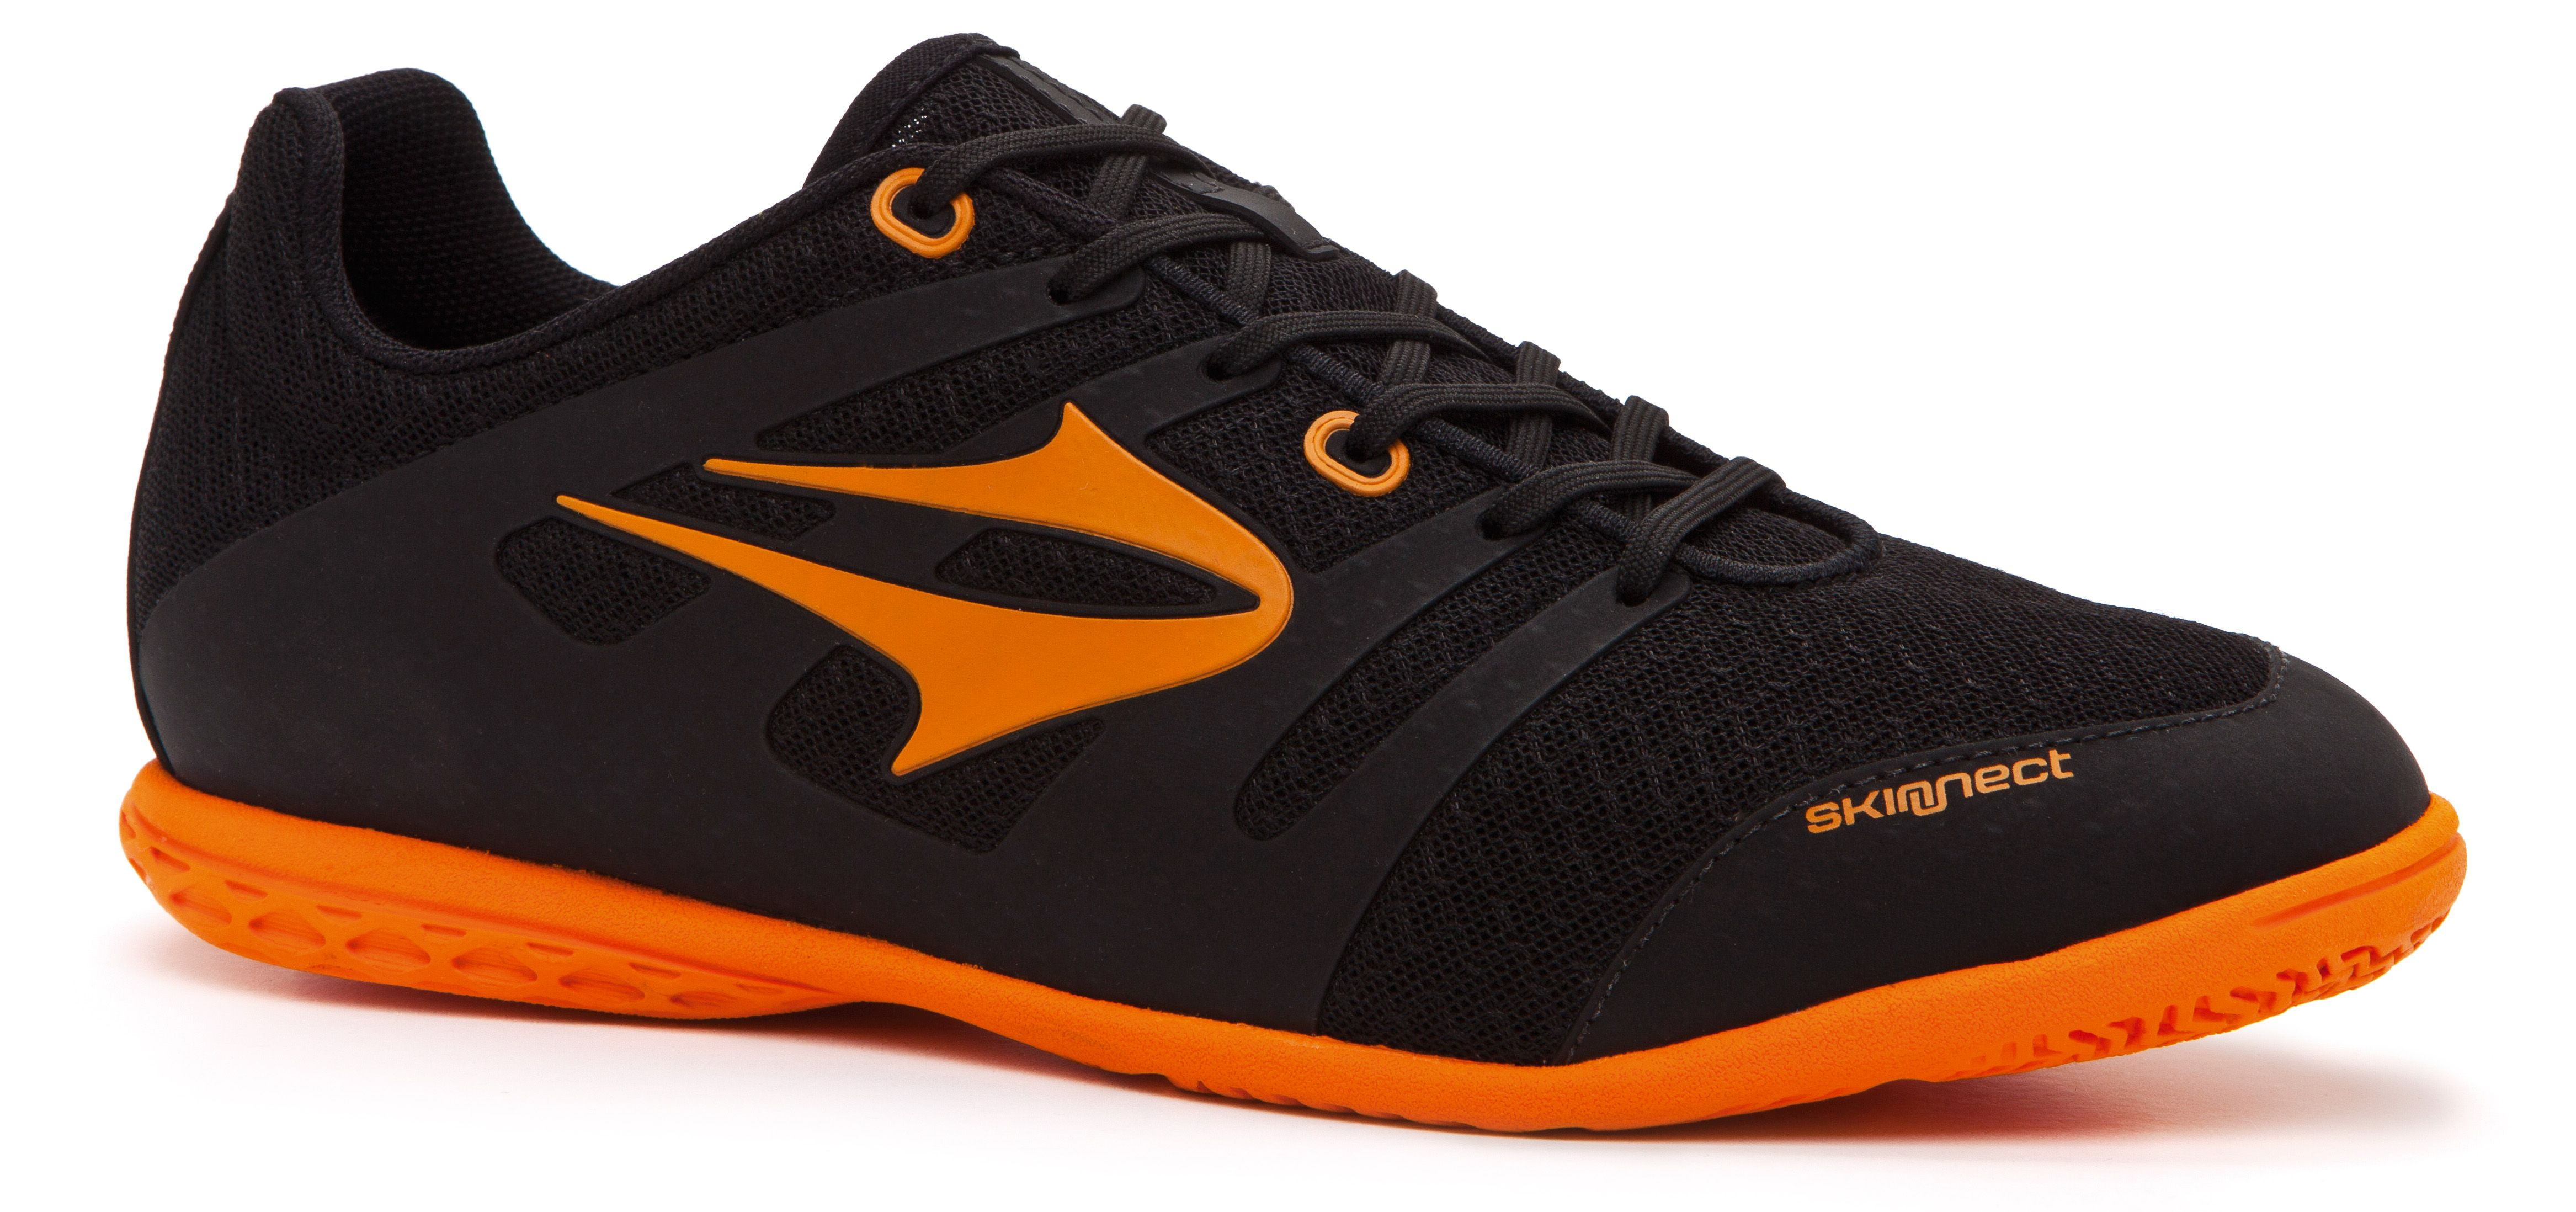 74a0e85d8b 2015 Chuteira Topper Letra futsal preta laranja